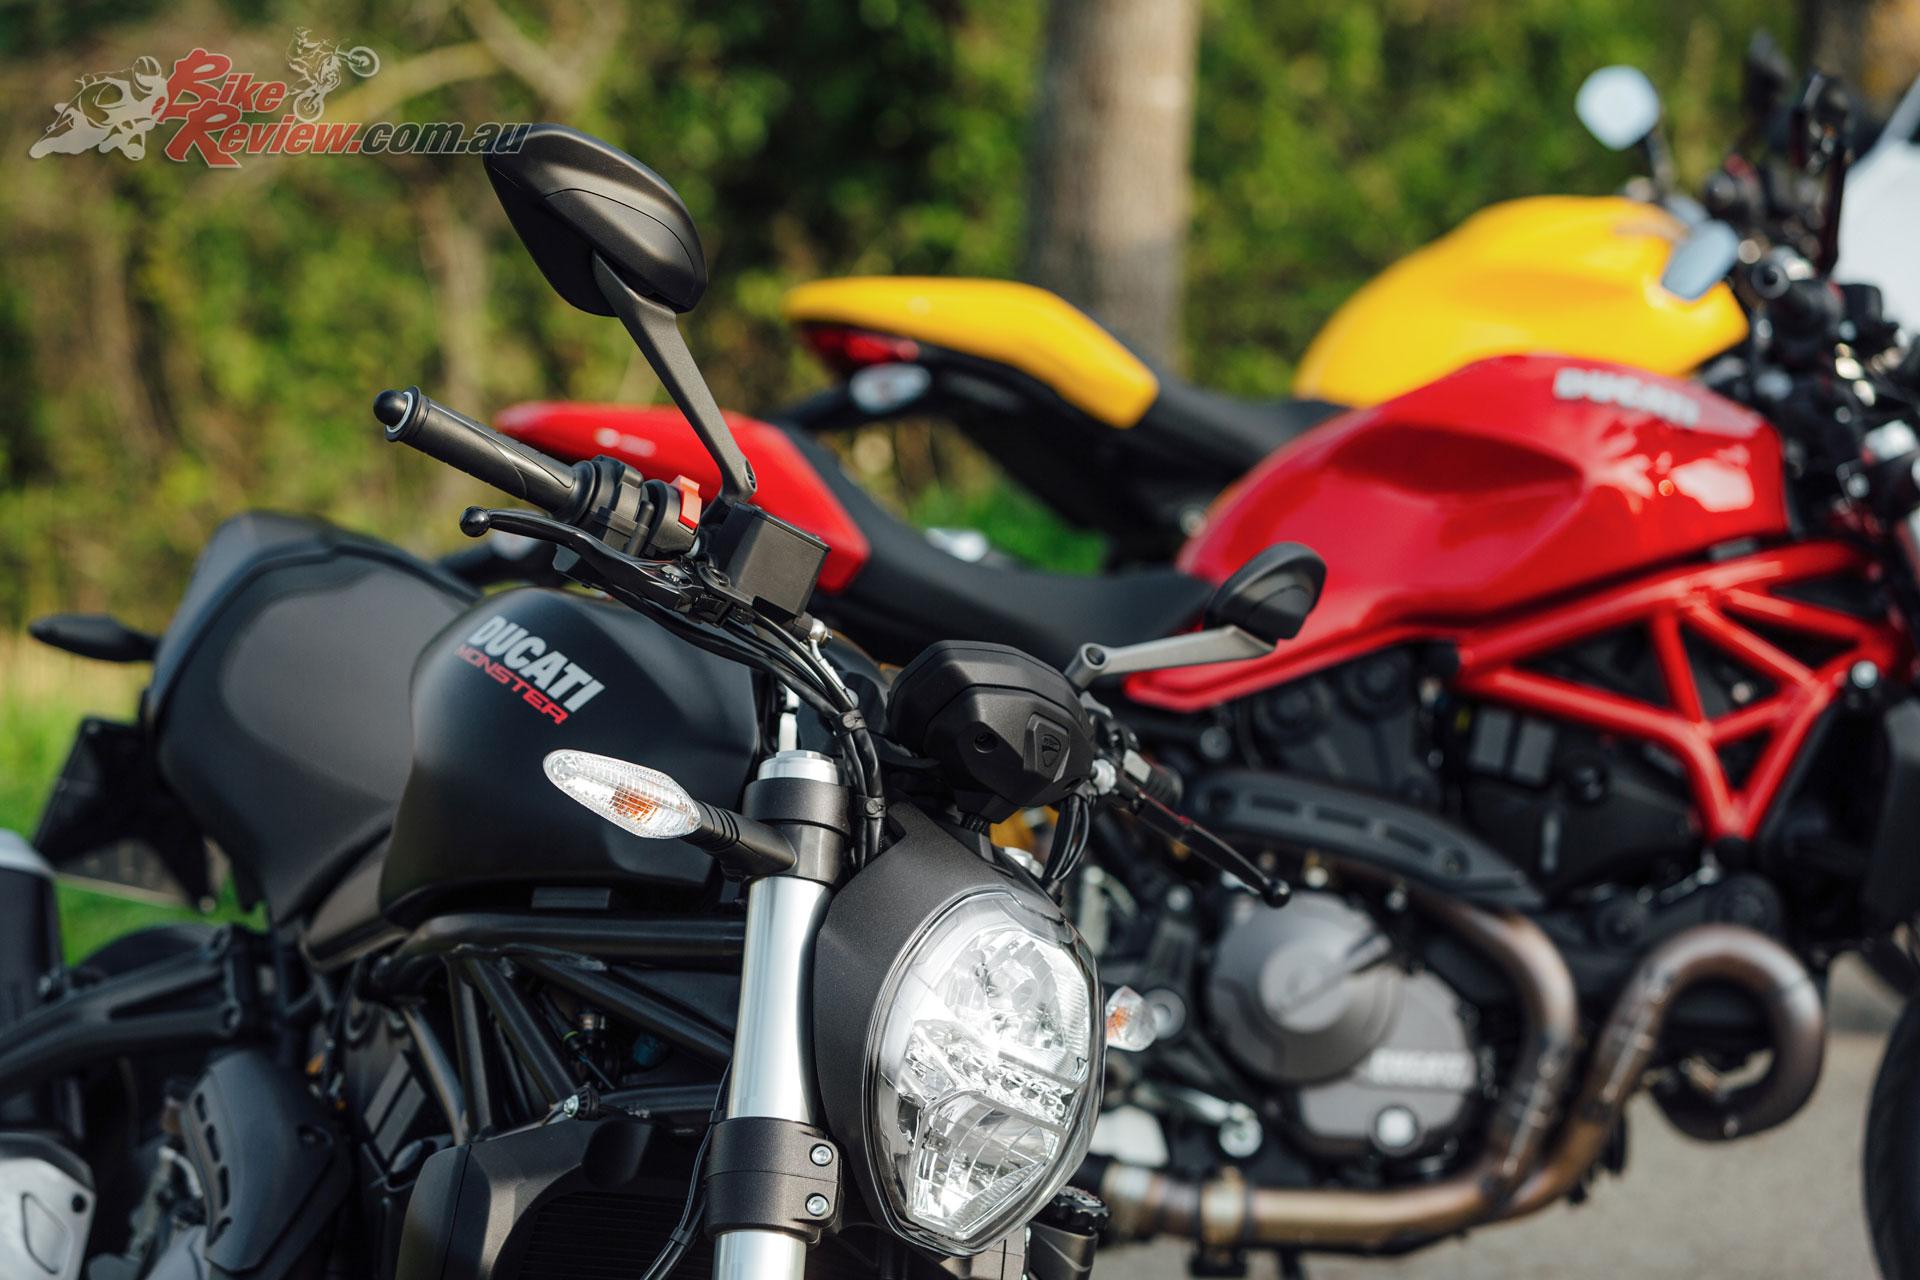 Ducati Monster S Review